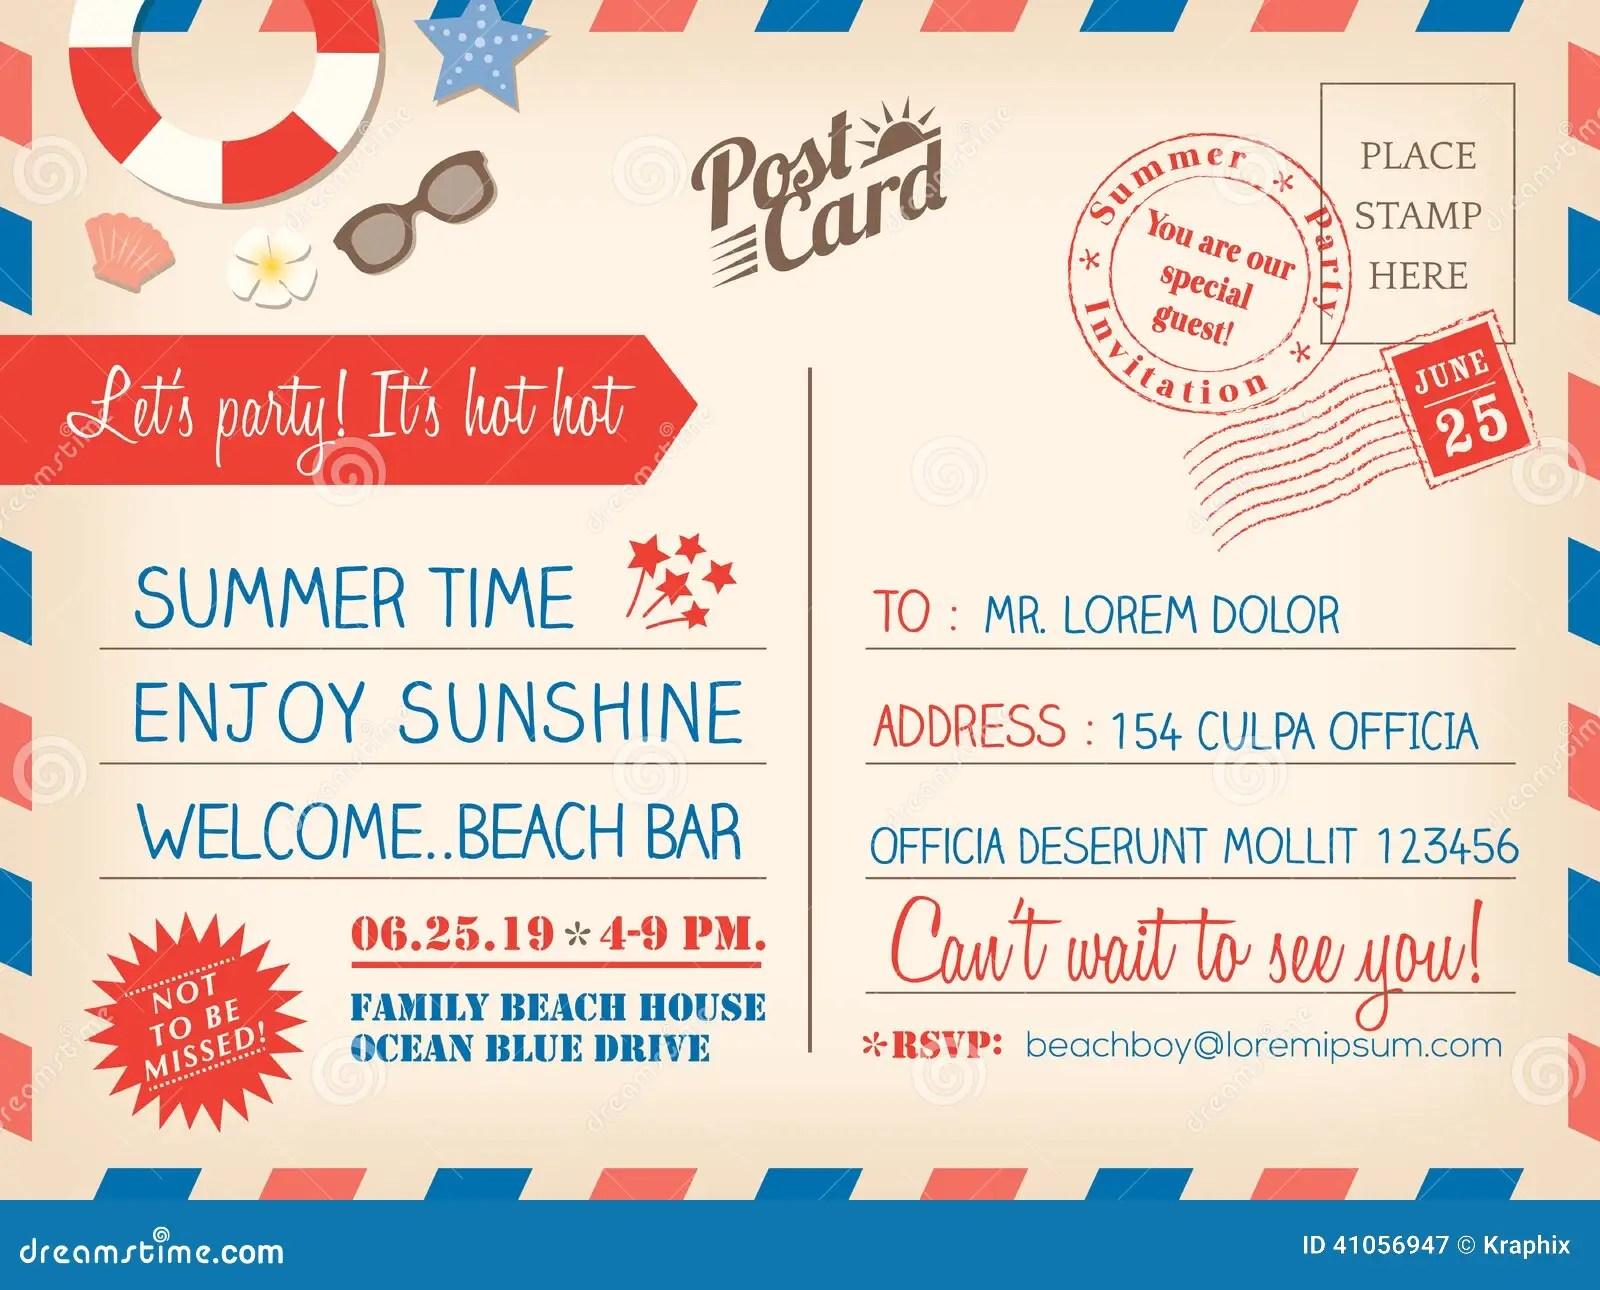 Vintage Summer Holiday Postcard Background Template For